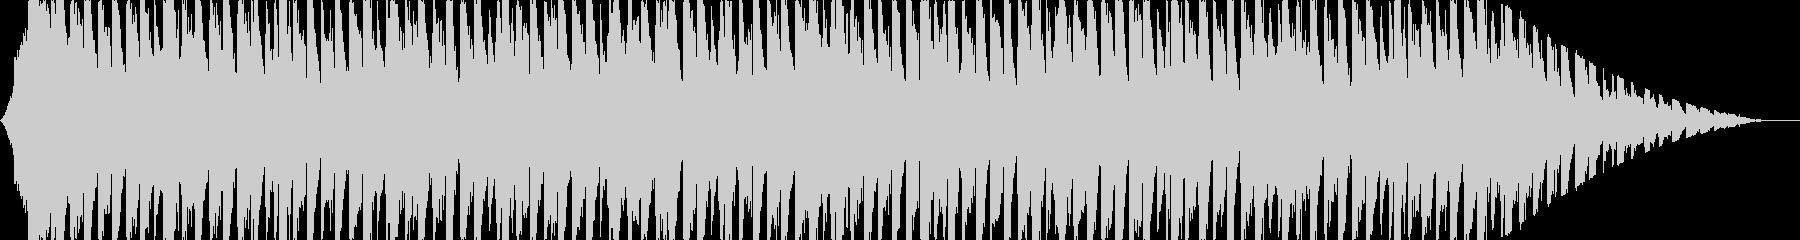 mp3 / 44.1kHz / 320…の未再生の波形